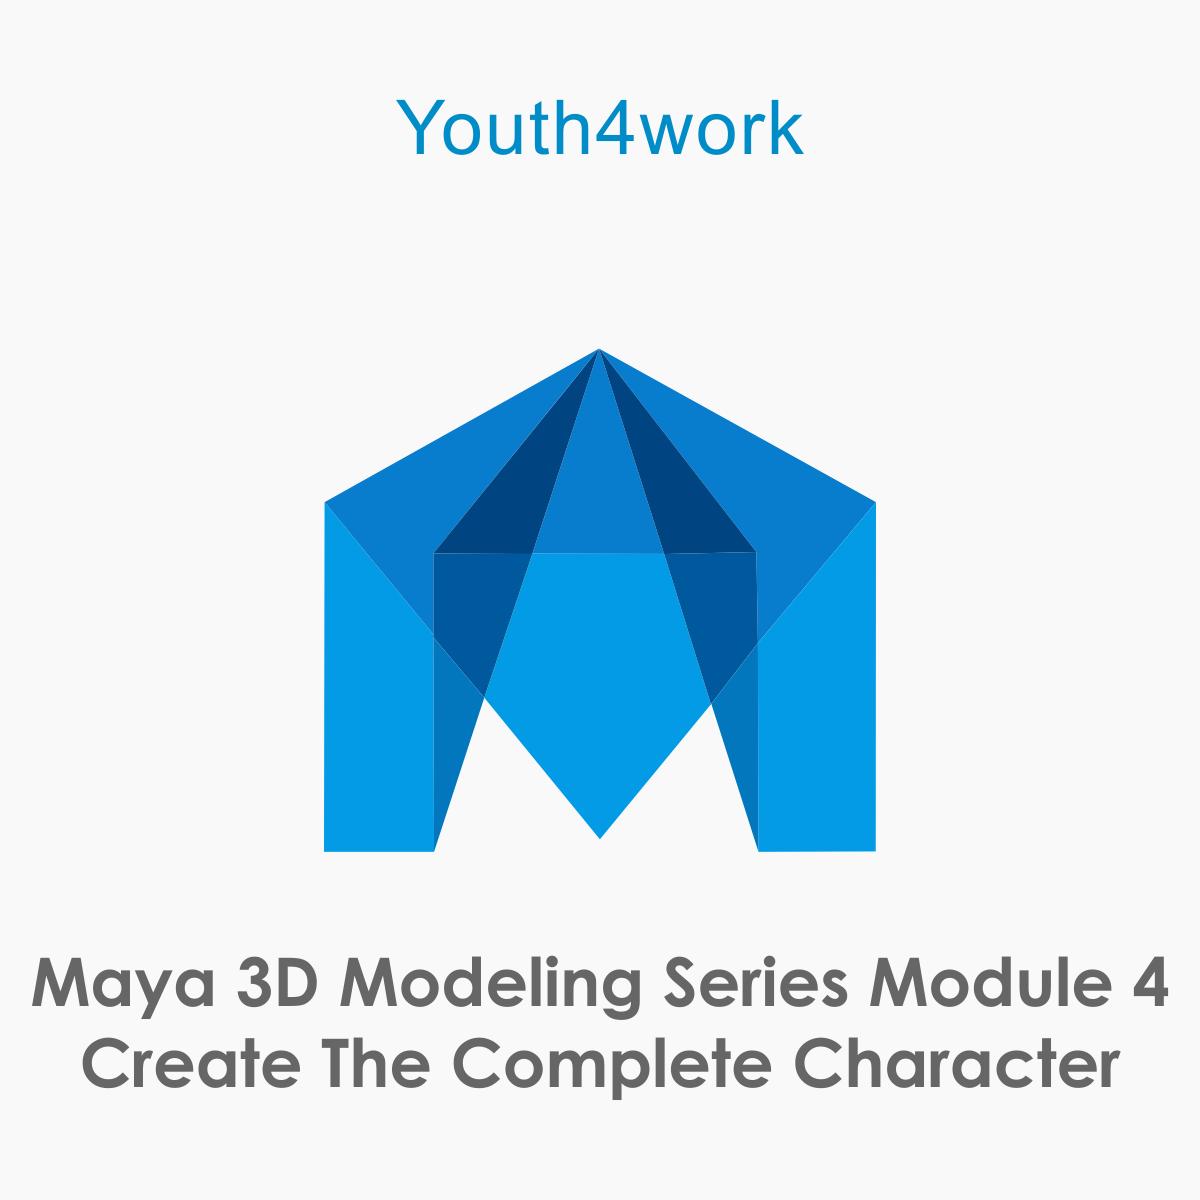 Maya 3D Modeling Series Module 4